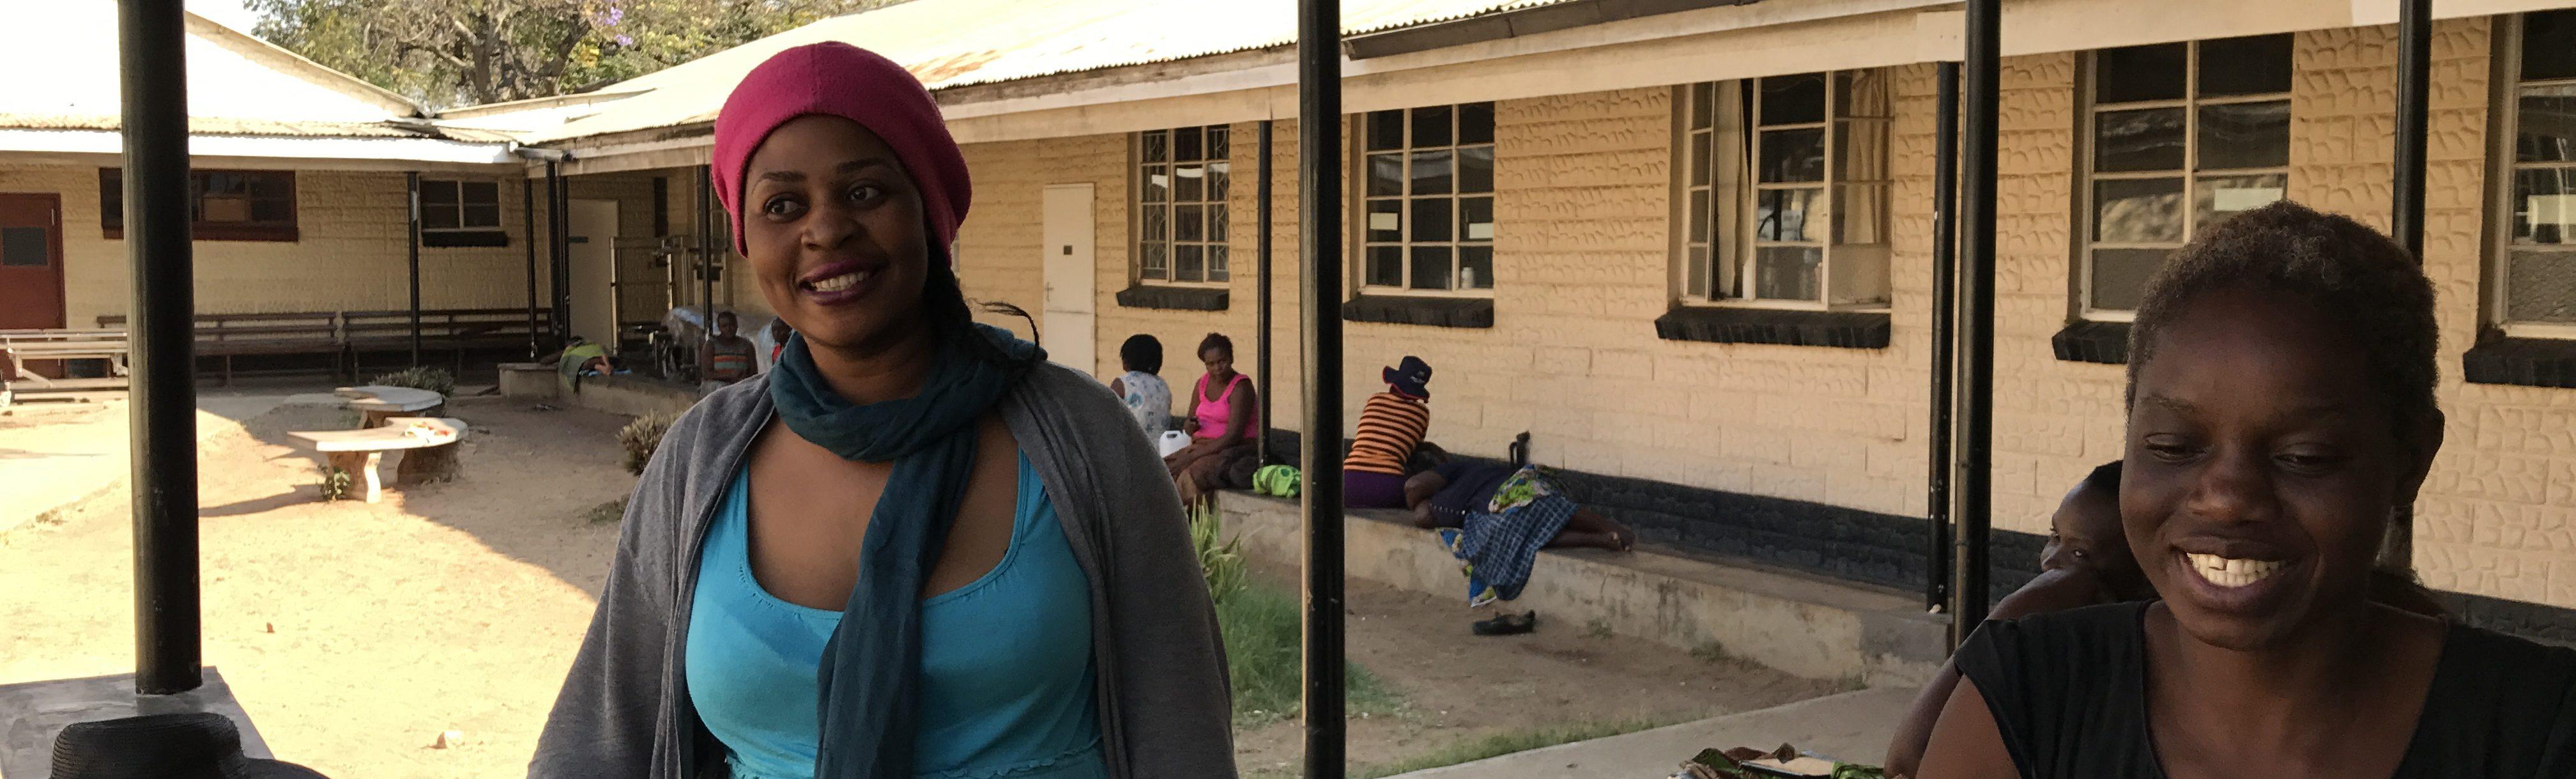 Frauen bei Karanda Mission